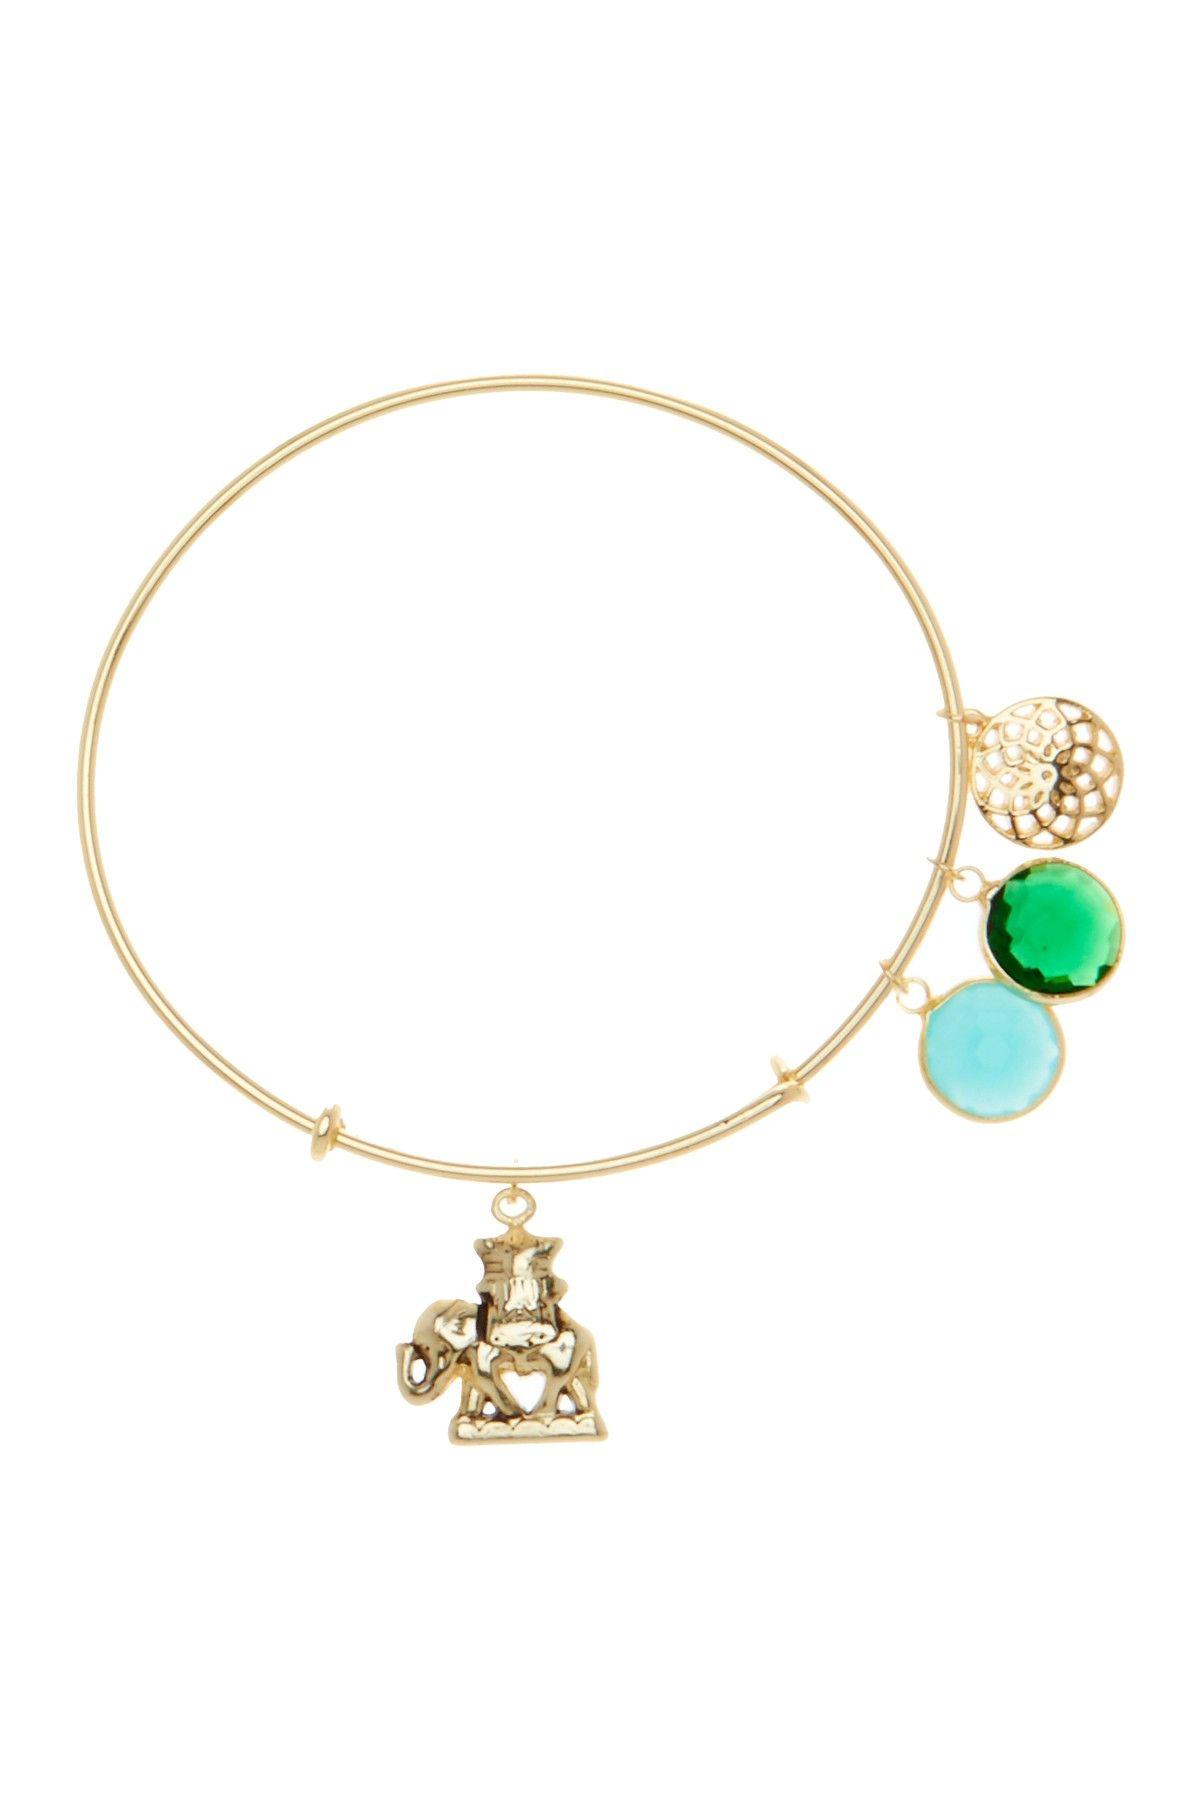 Royal Elephant & Multi Stone Adjustable Charm Bracelet